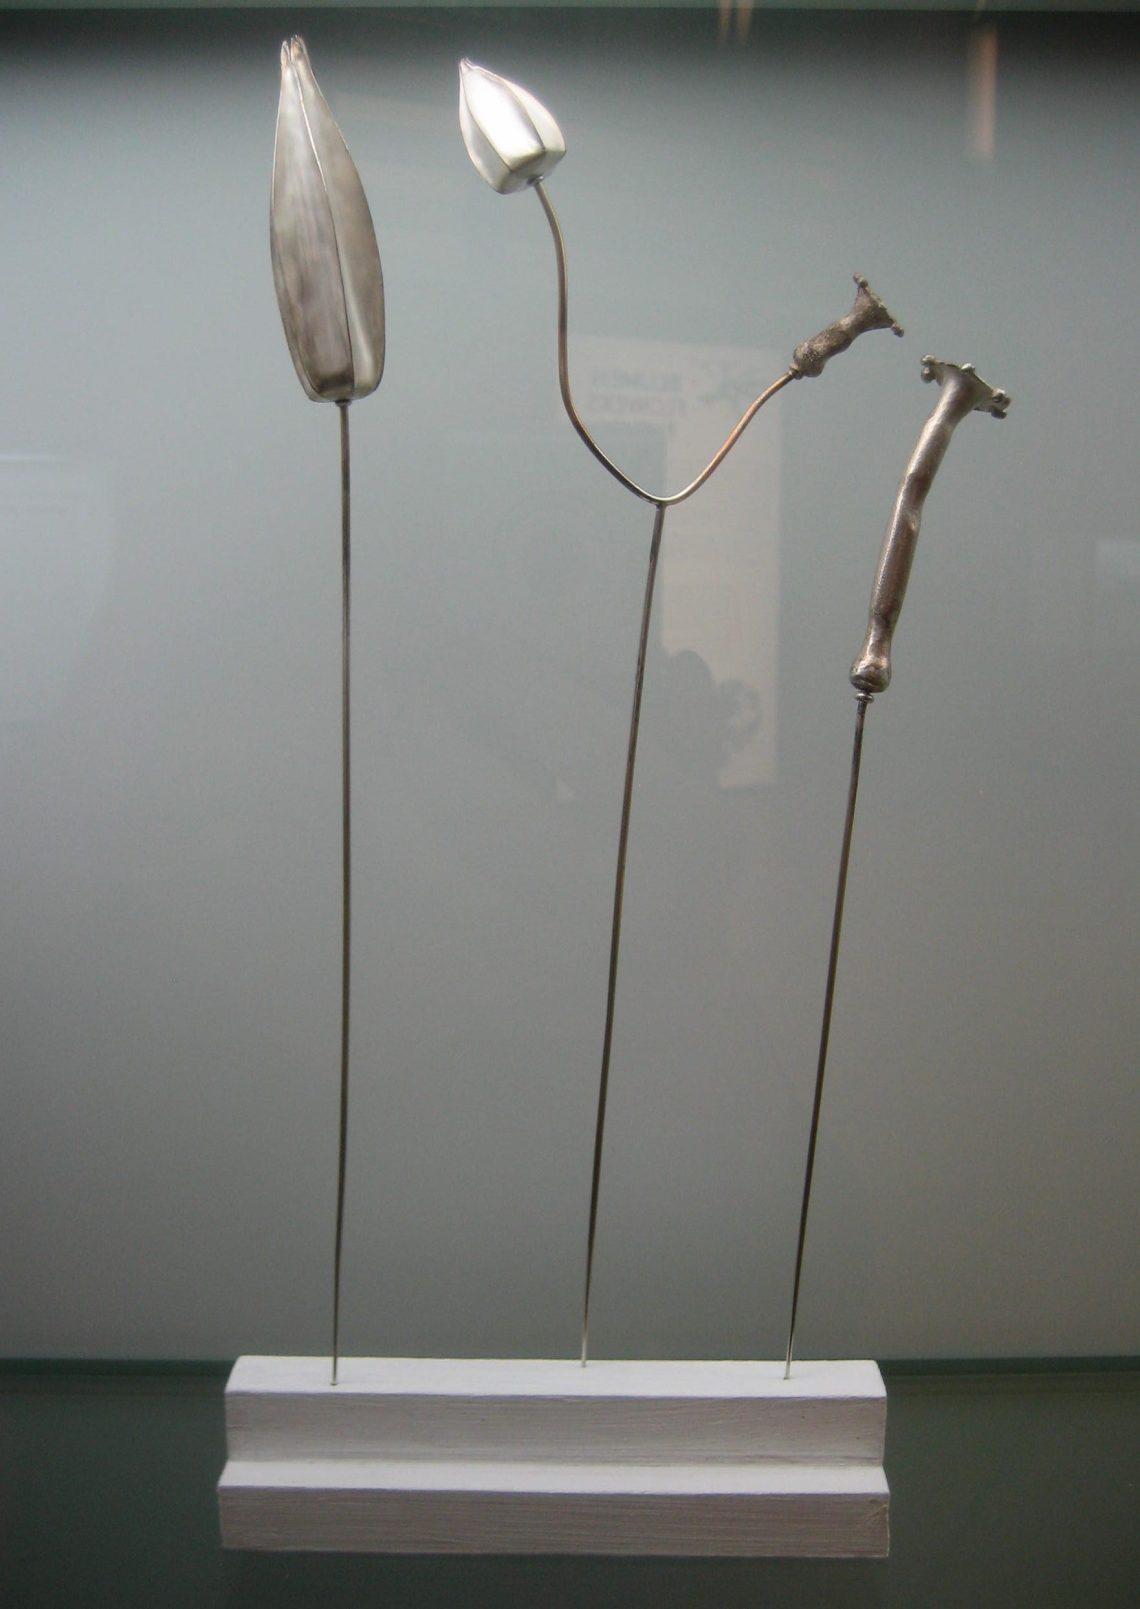 Gabriela Fink, Gegensätze, 1998. Collectie Grassimuseum. Foto Esther Doornbusch, mei 2018, CC BY 4.0